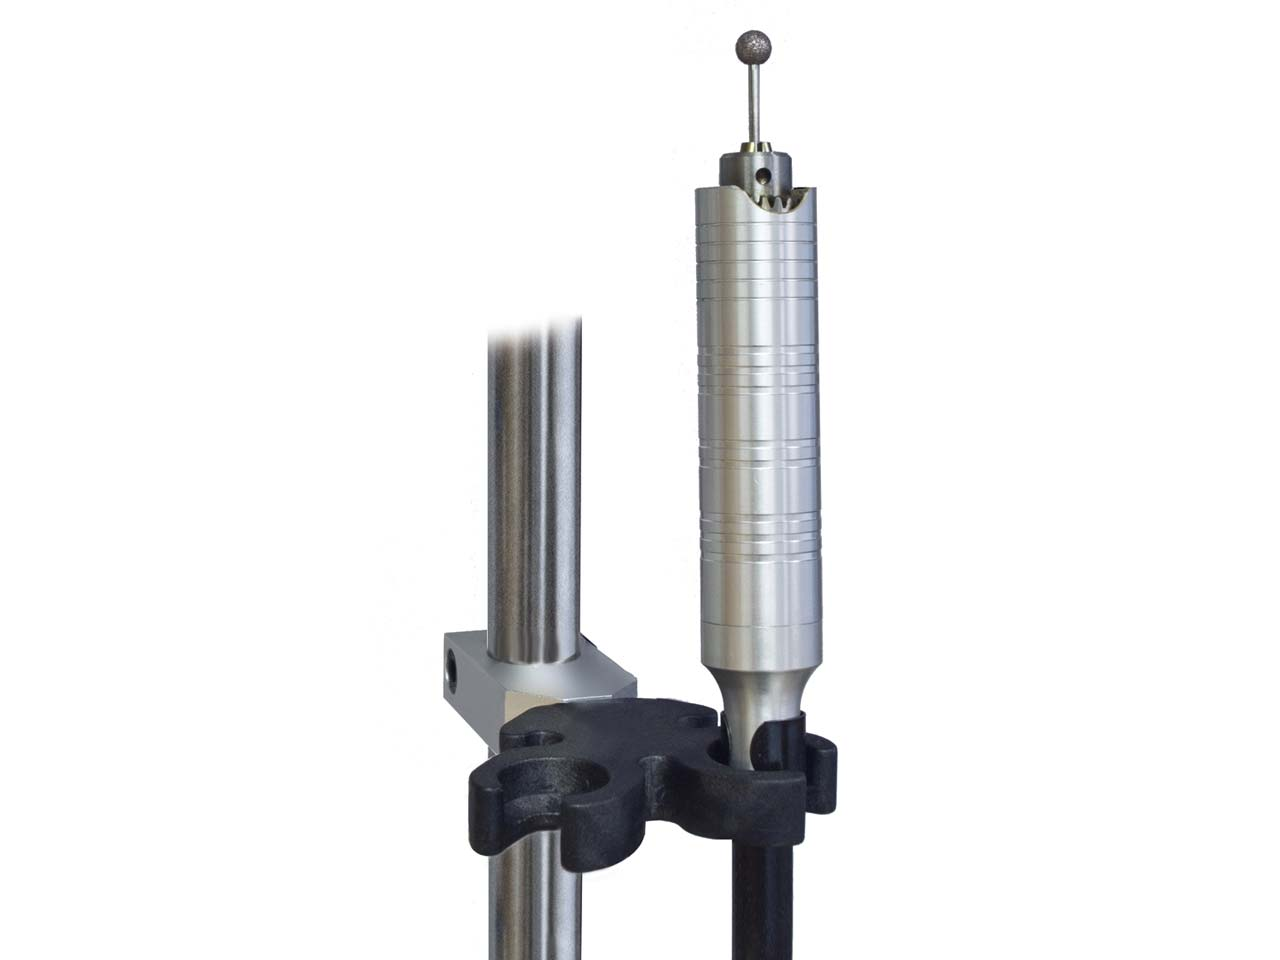 Genuine-US-Foredom-Workbench-Accessories-System miniatura 10